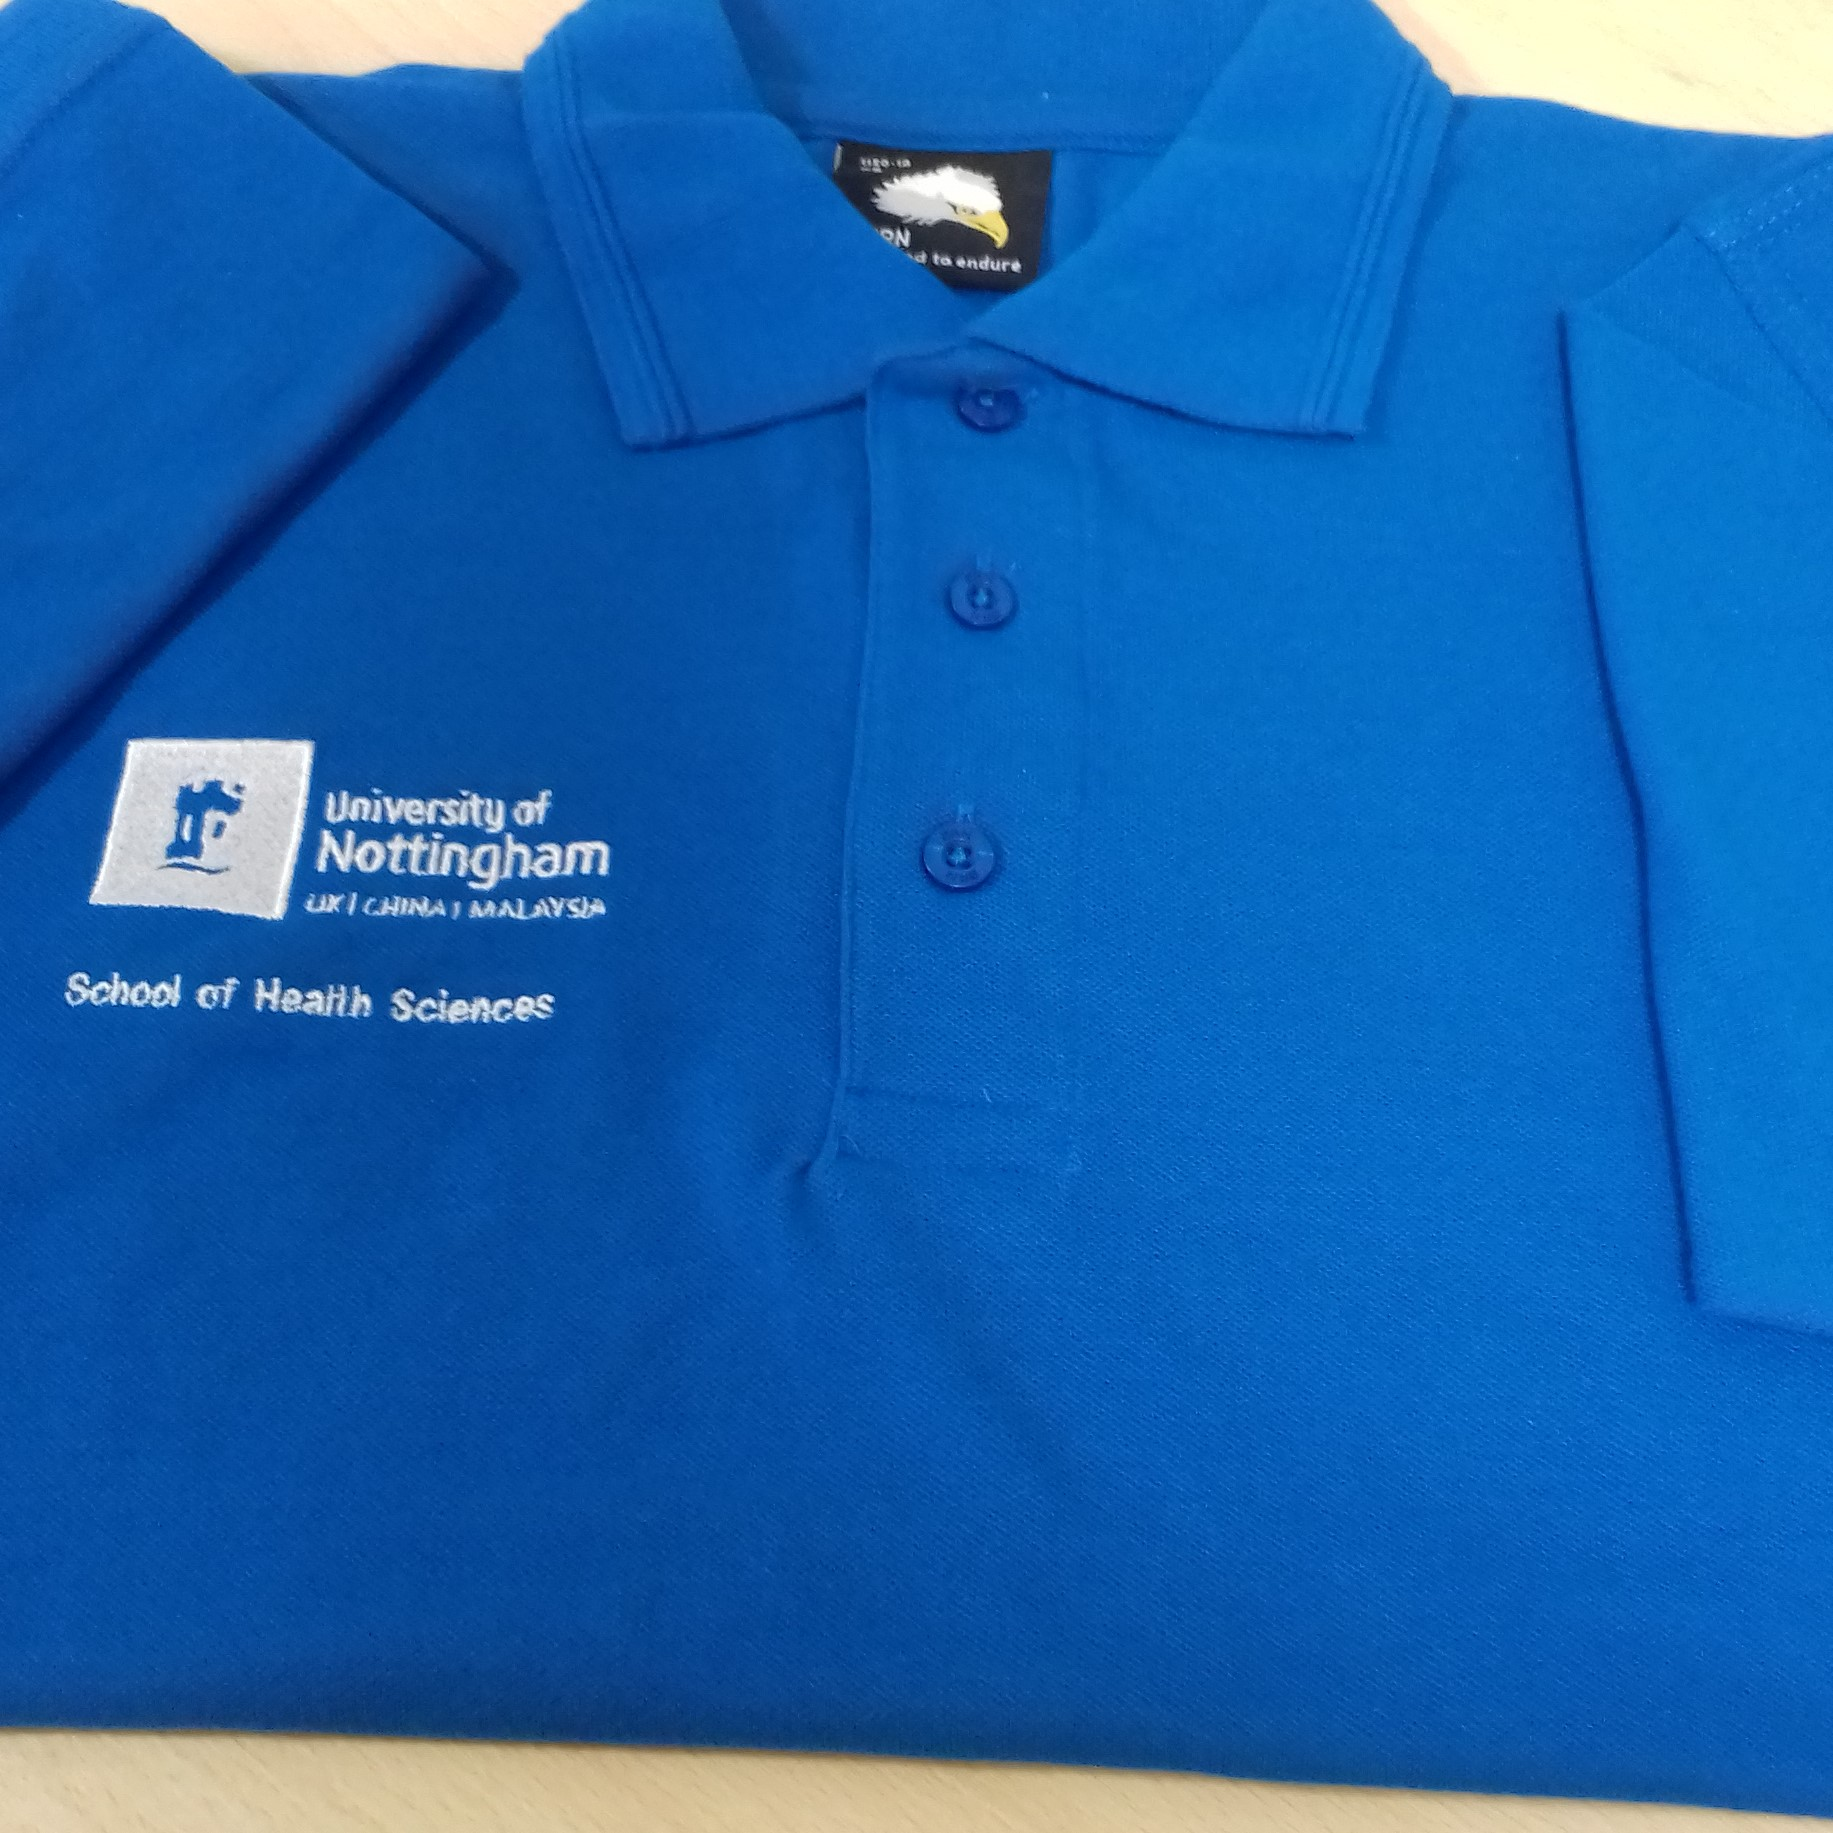 new product 827d4 9c880 Clinical Skills T-shirt | University of Nottingham Online Store